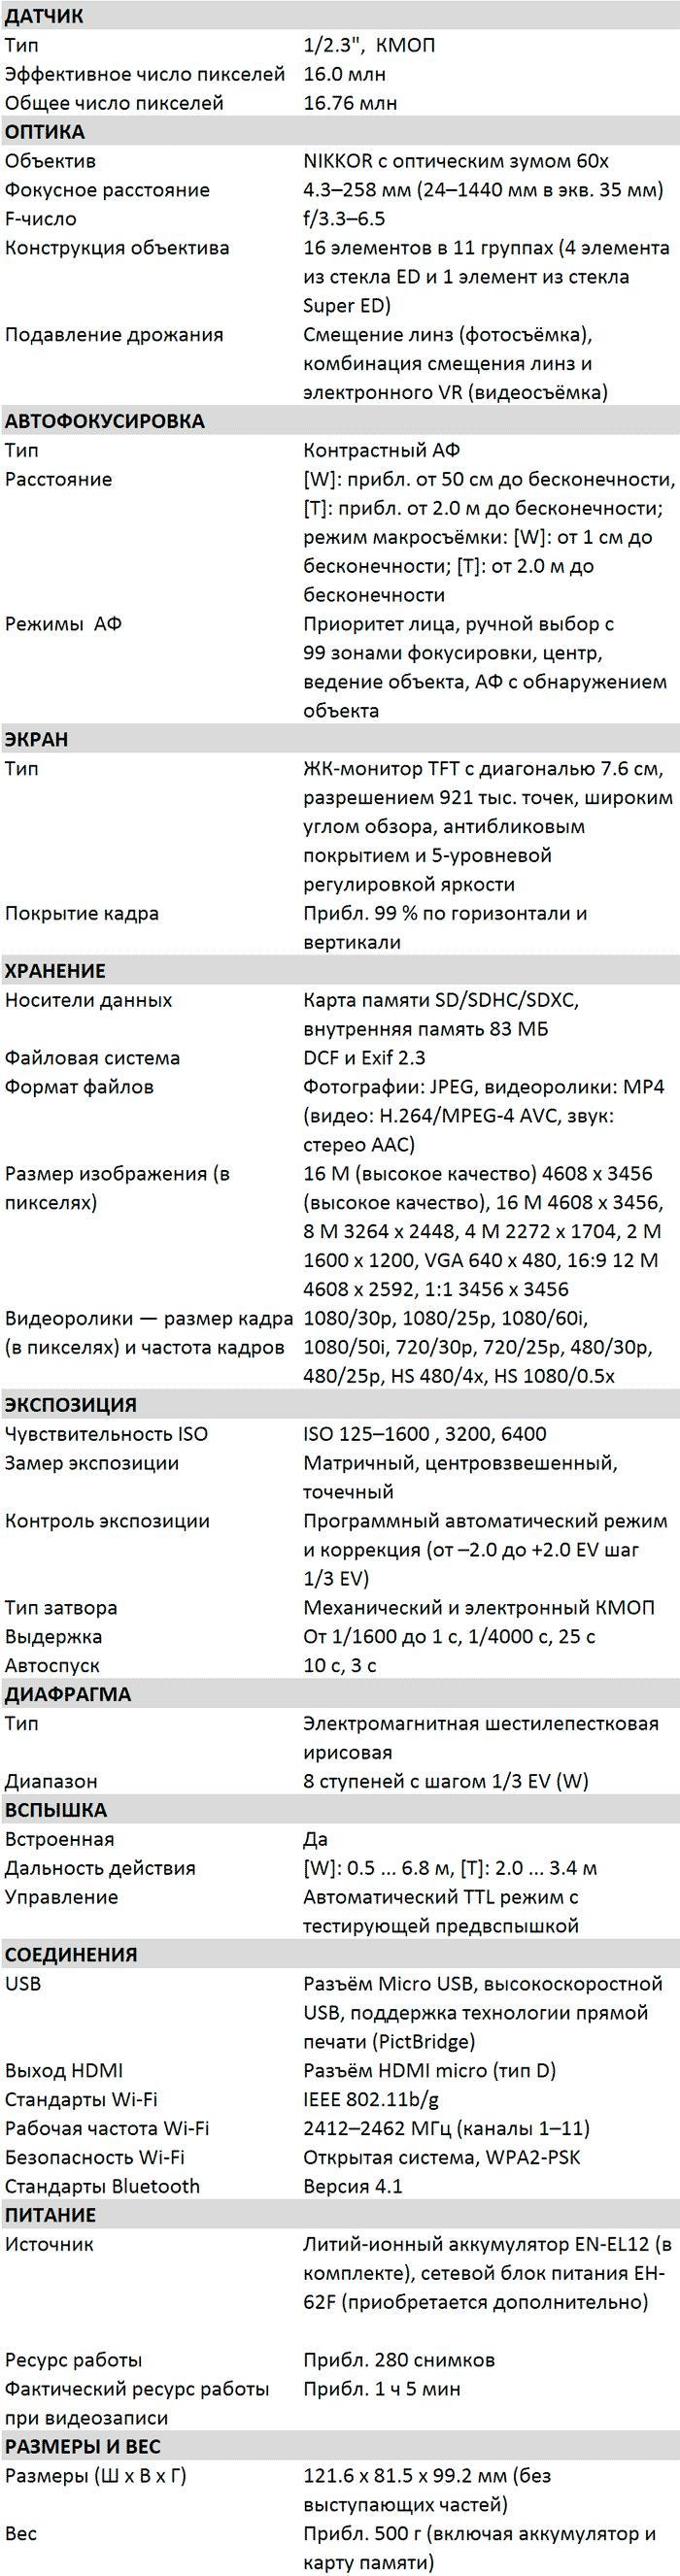 Характеристики Coolpix B600